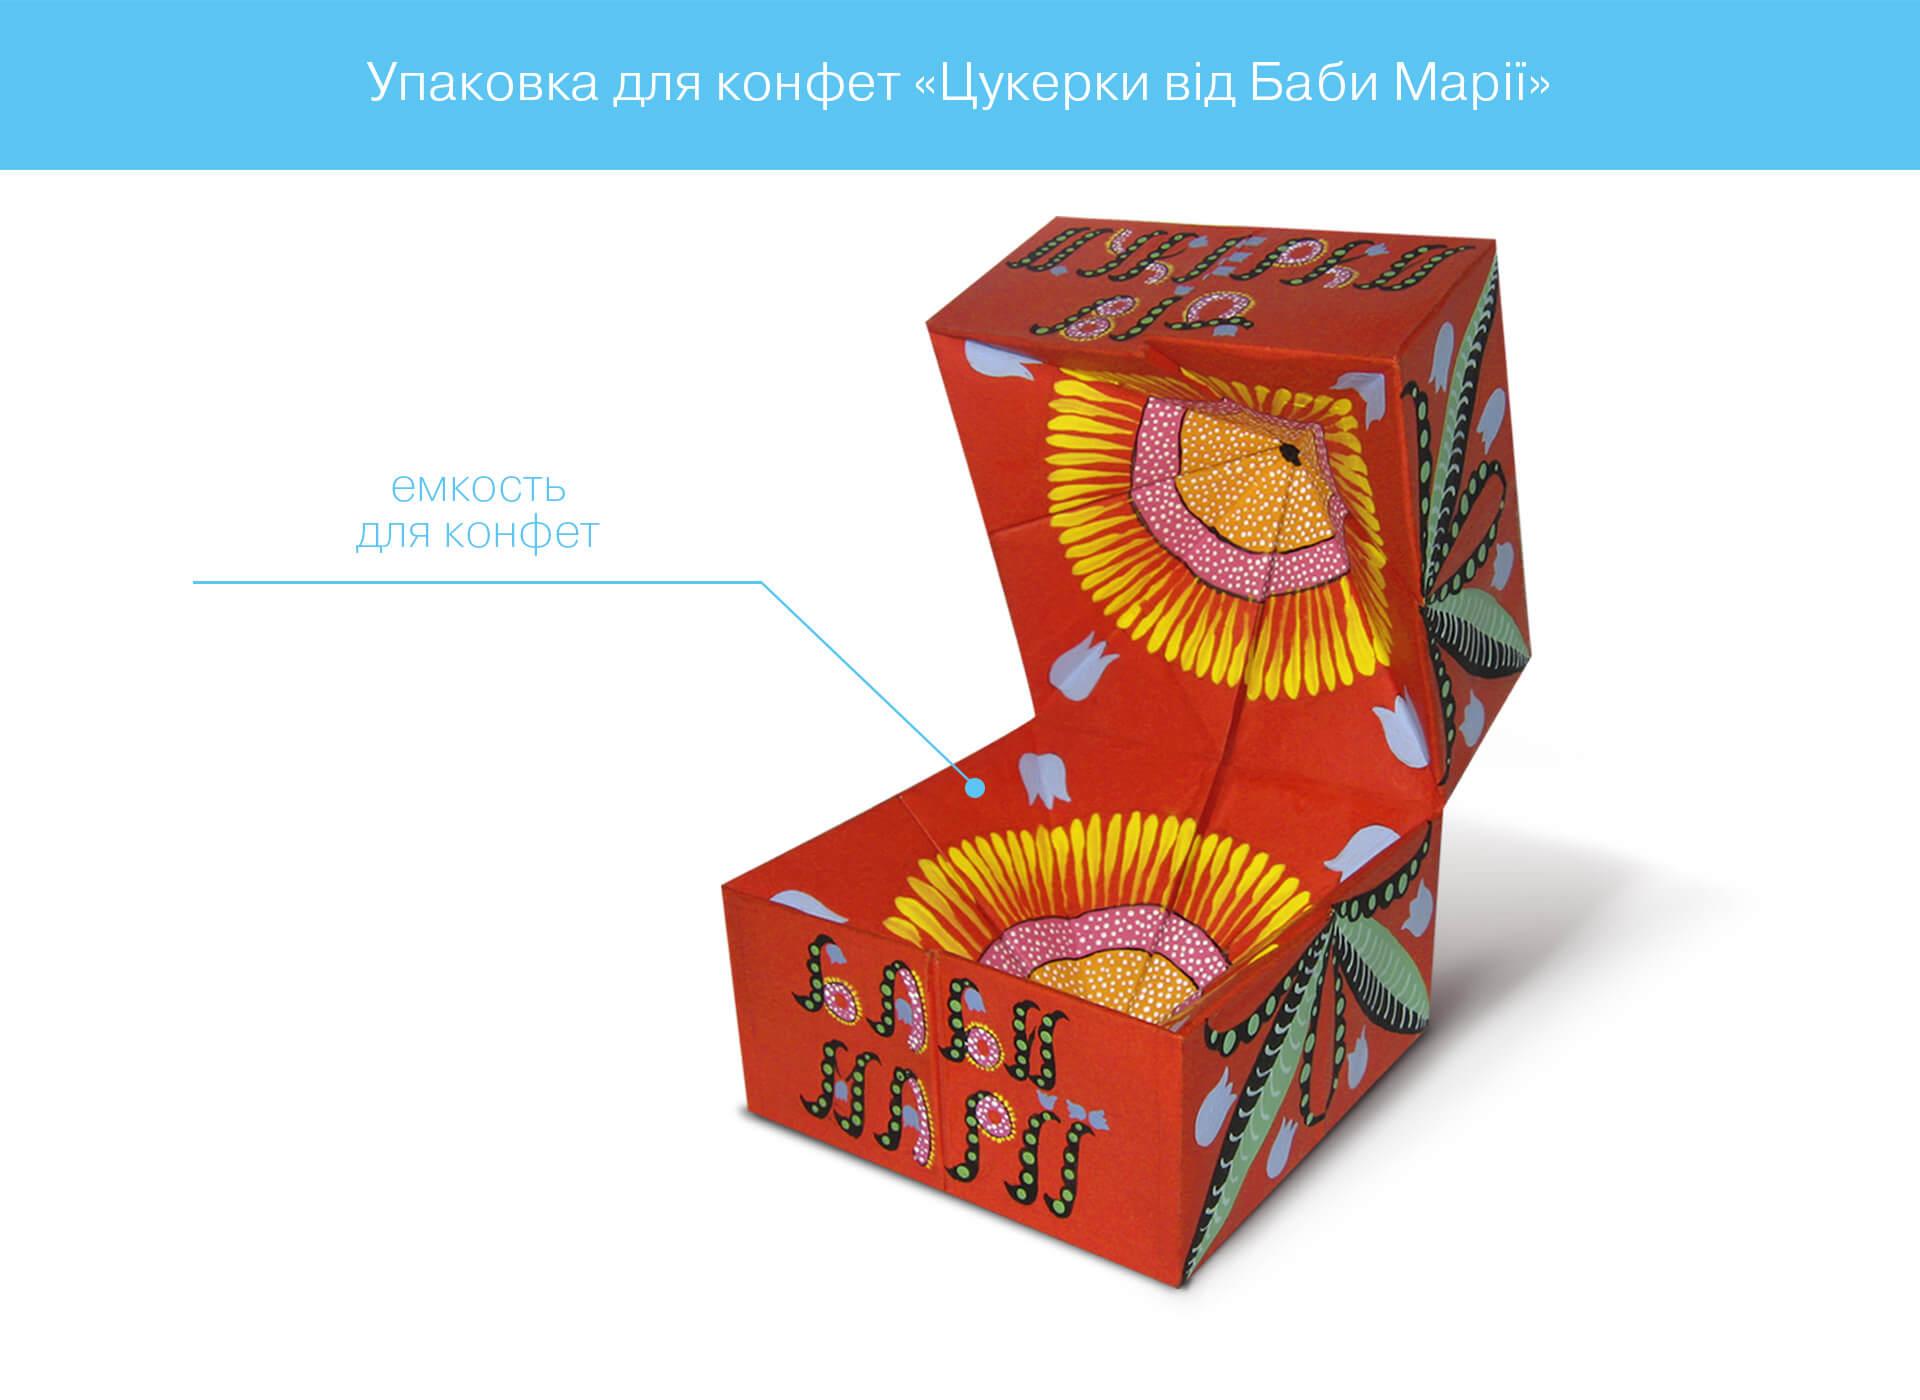 prokochuk_irina_packing-tsukerki-od-babi-mari%d1%97_